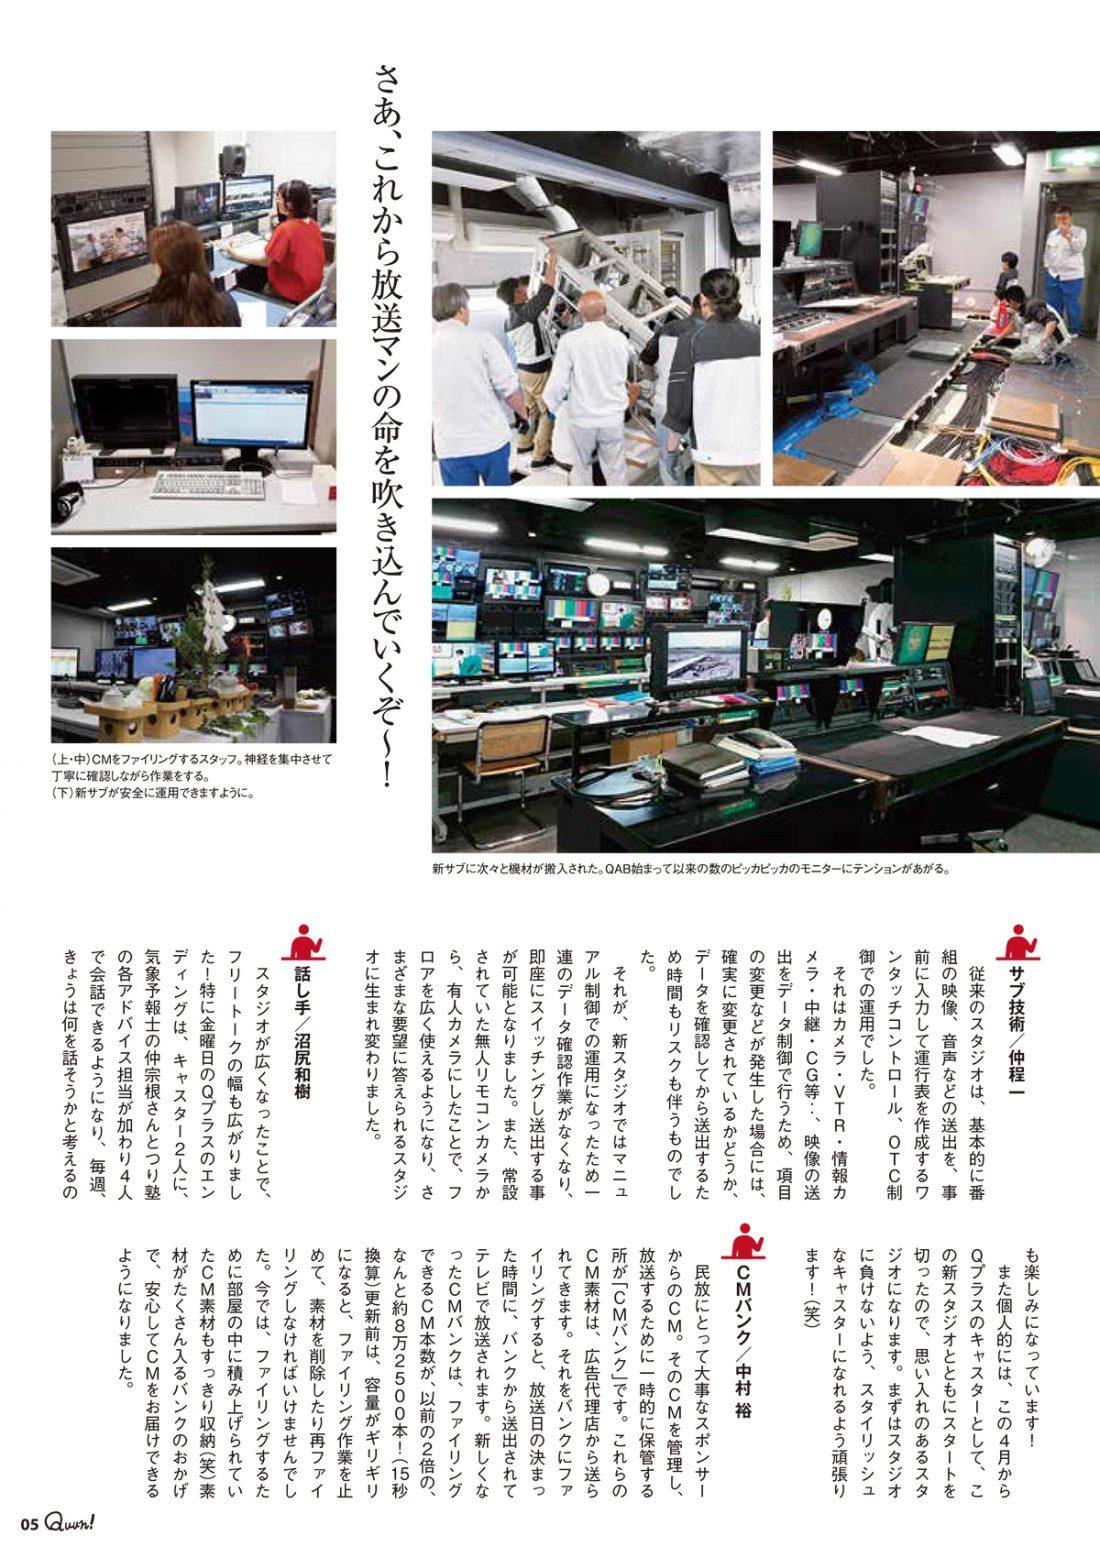 http://www.qab.co.jp/qgoro/wp-content/uploads/quun_0807-1100x1558.jpg